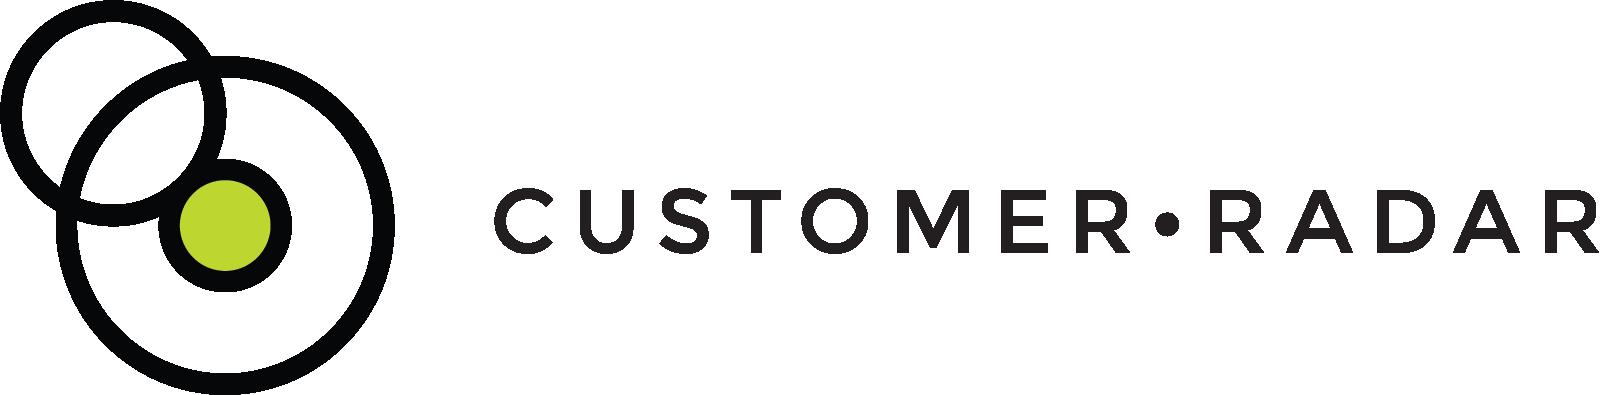 Customer Radar logo.png